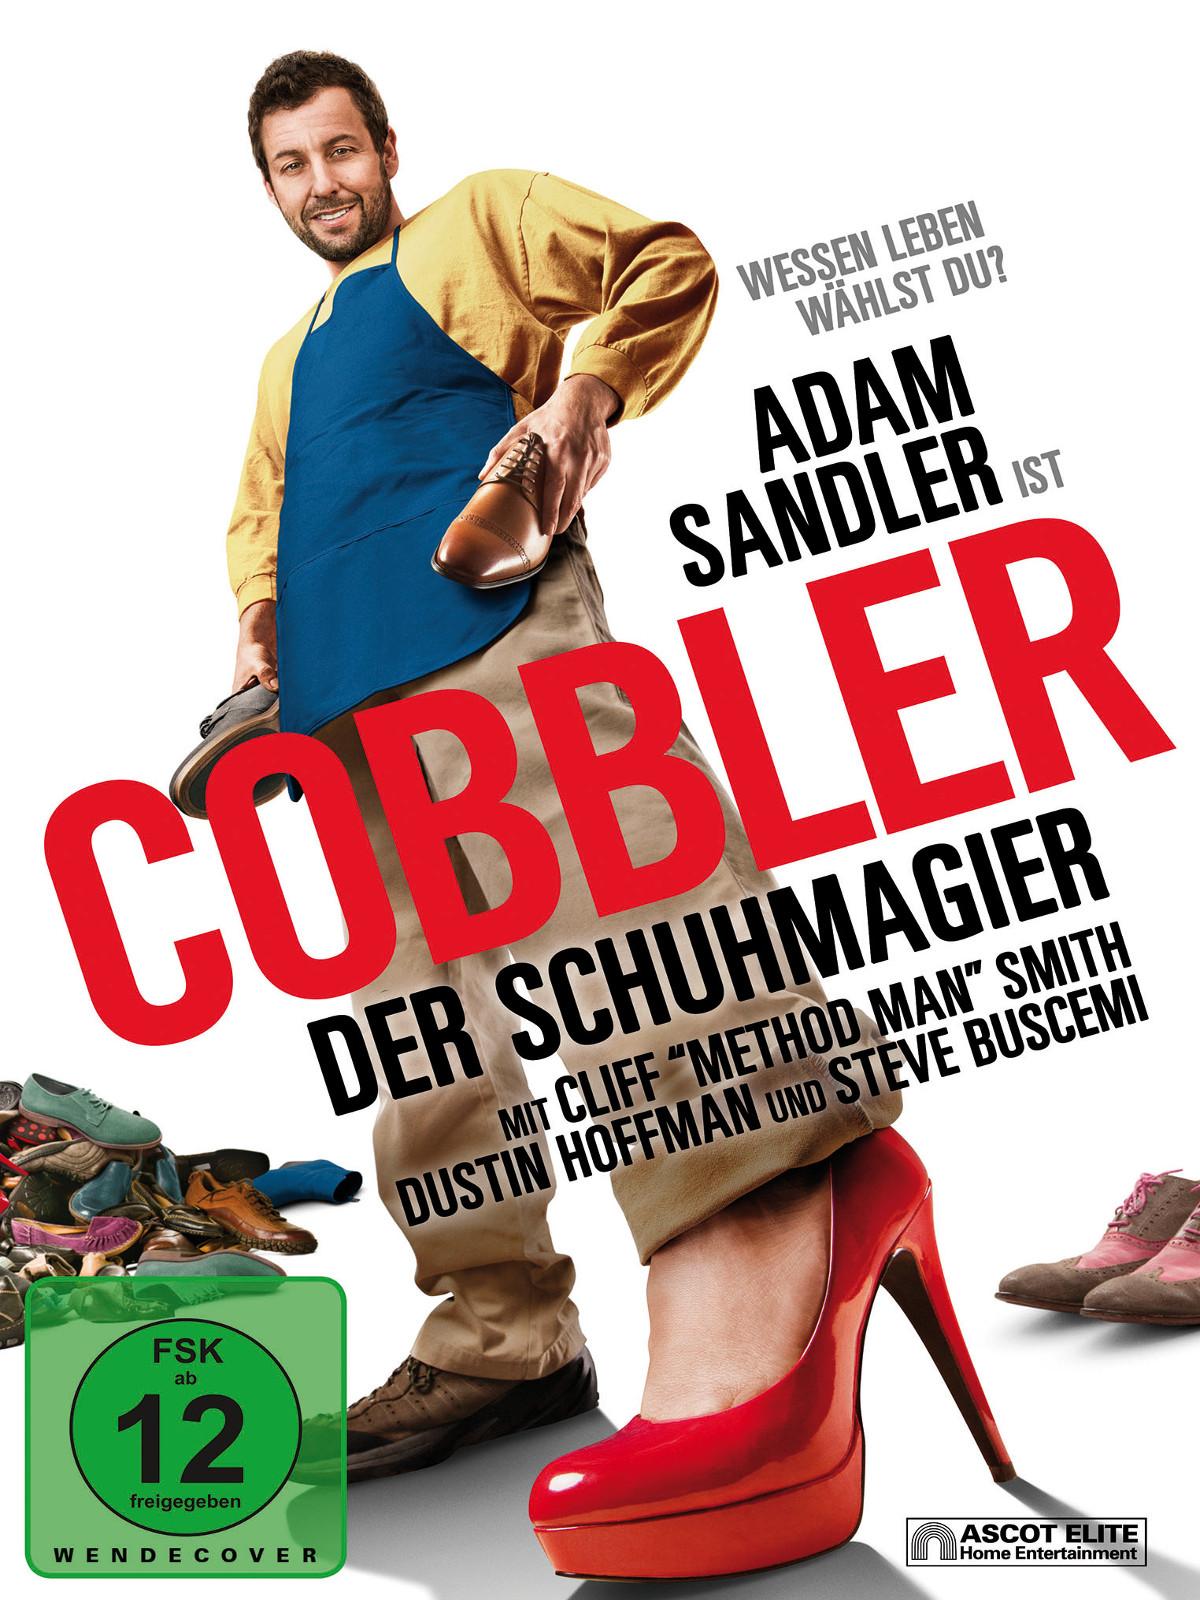 Cobbler - Der Schuhmagier (2015) HD Stream » …